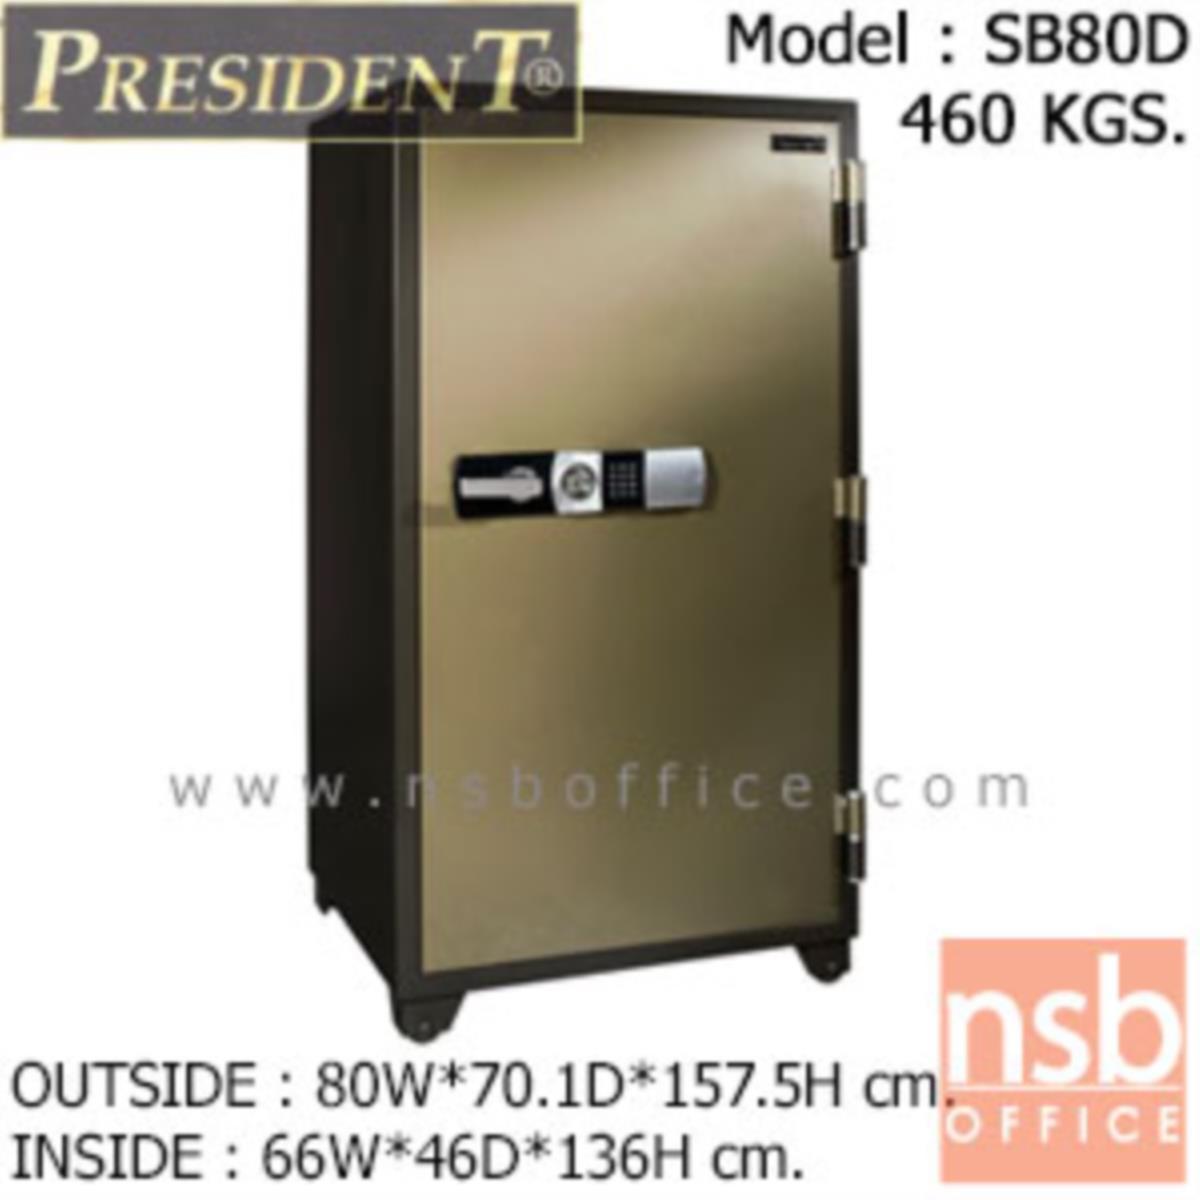 F05A053:ตู้เซฟนิรภัยชนิดดิจิตอล 460 กก. รุ่น PRESIDENT-SB80D  มี 1 กุญแจ 1 รหัส (รหัสใช้กดหน้าตู้)